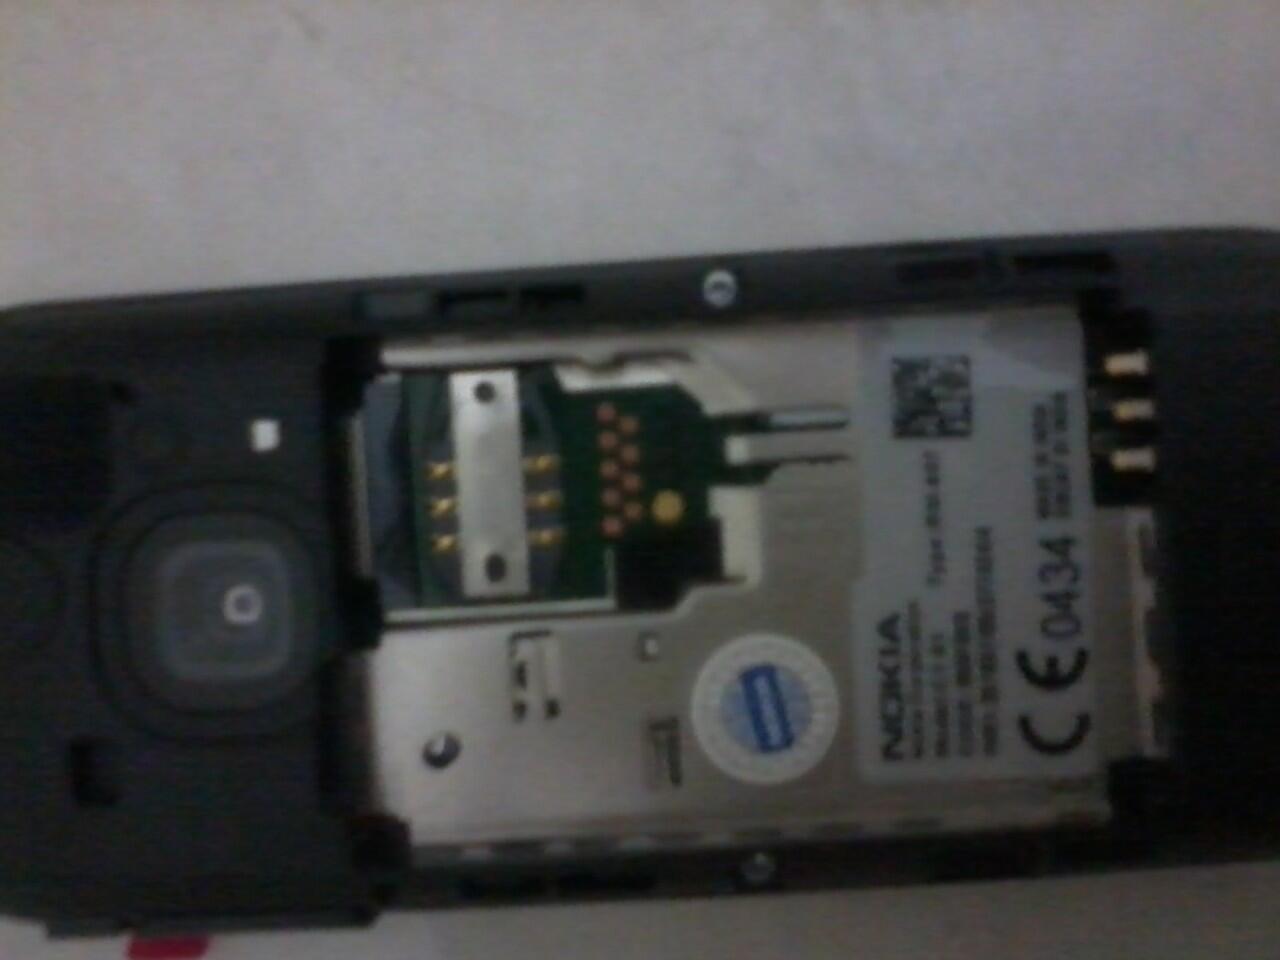 JUAL - Nokia C1-01 garansi Agustus 2013